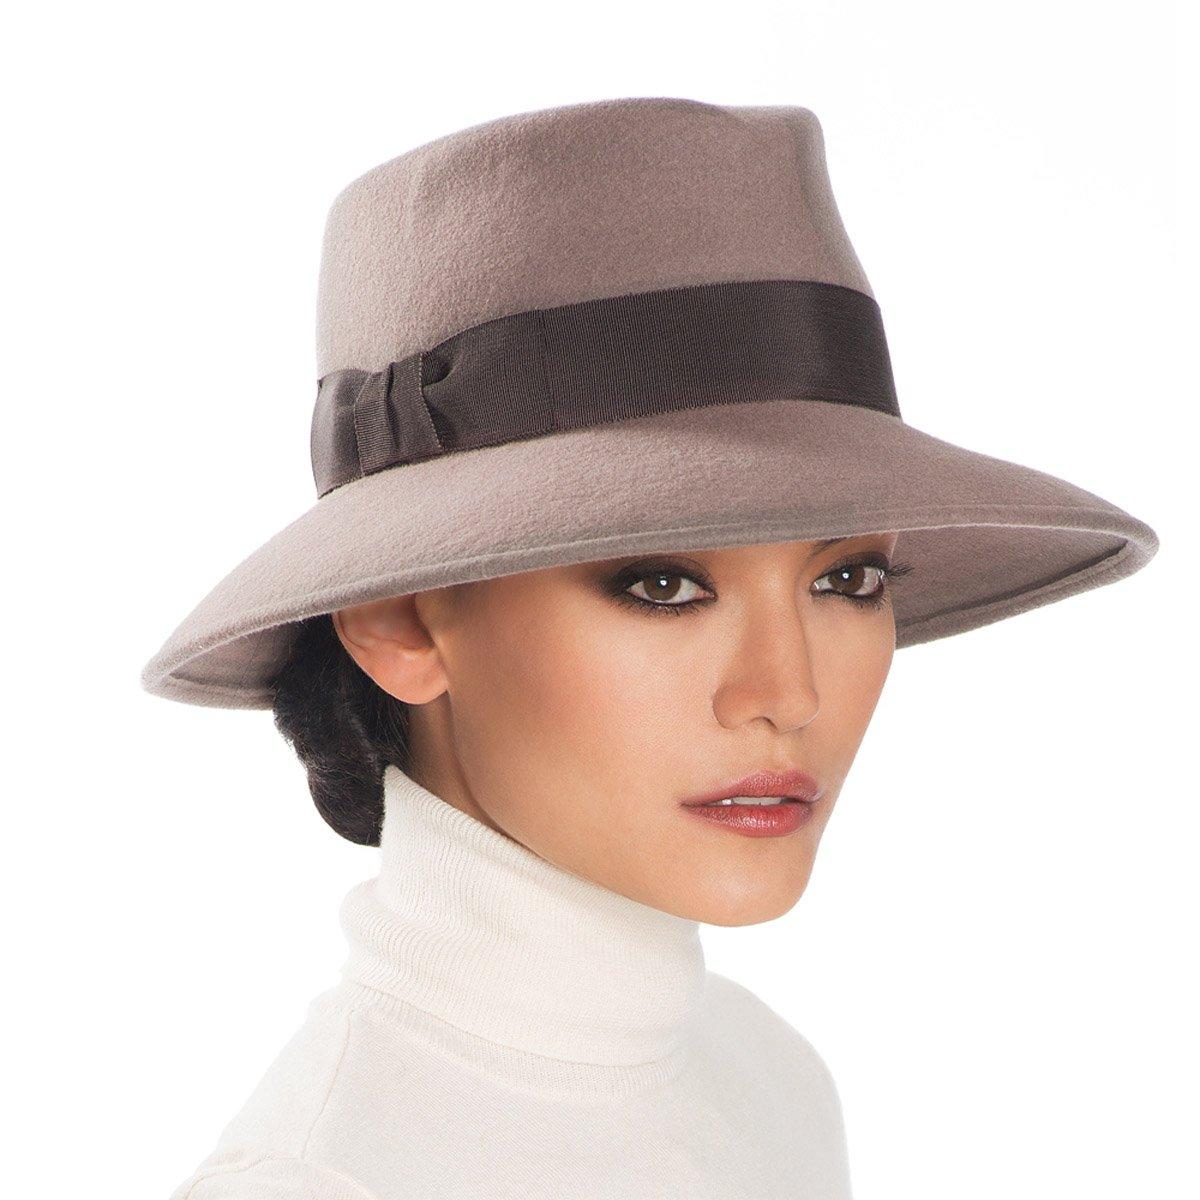 Eric Javits Luxury Fashion Designer Women's Headwear Hat - Wool Kim - Taupe by Eric Javits